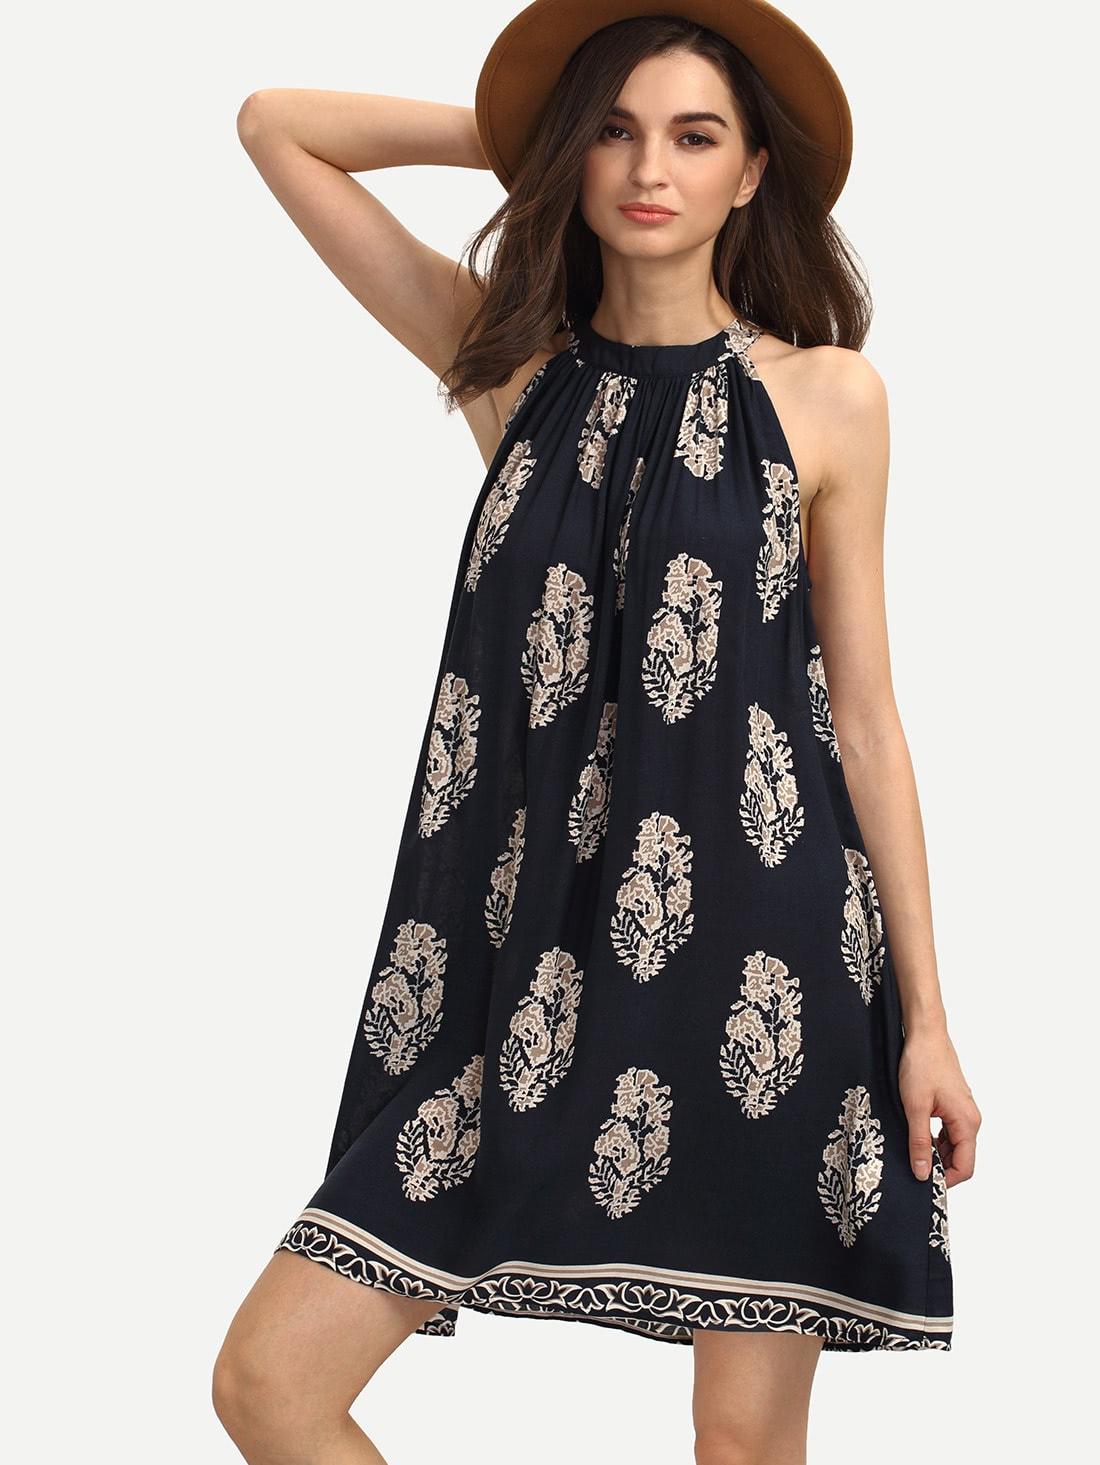 1824c4a35b56 KOZ1.com | Shop for latest women's fashion dresses, tops, bottoms.